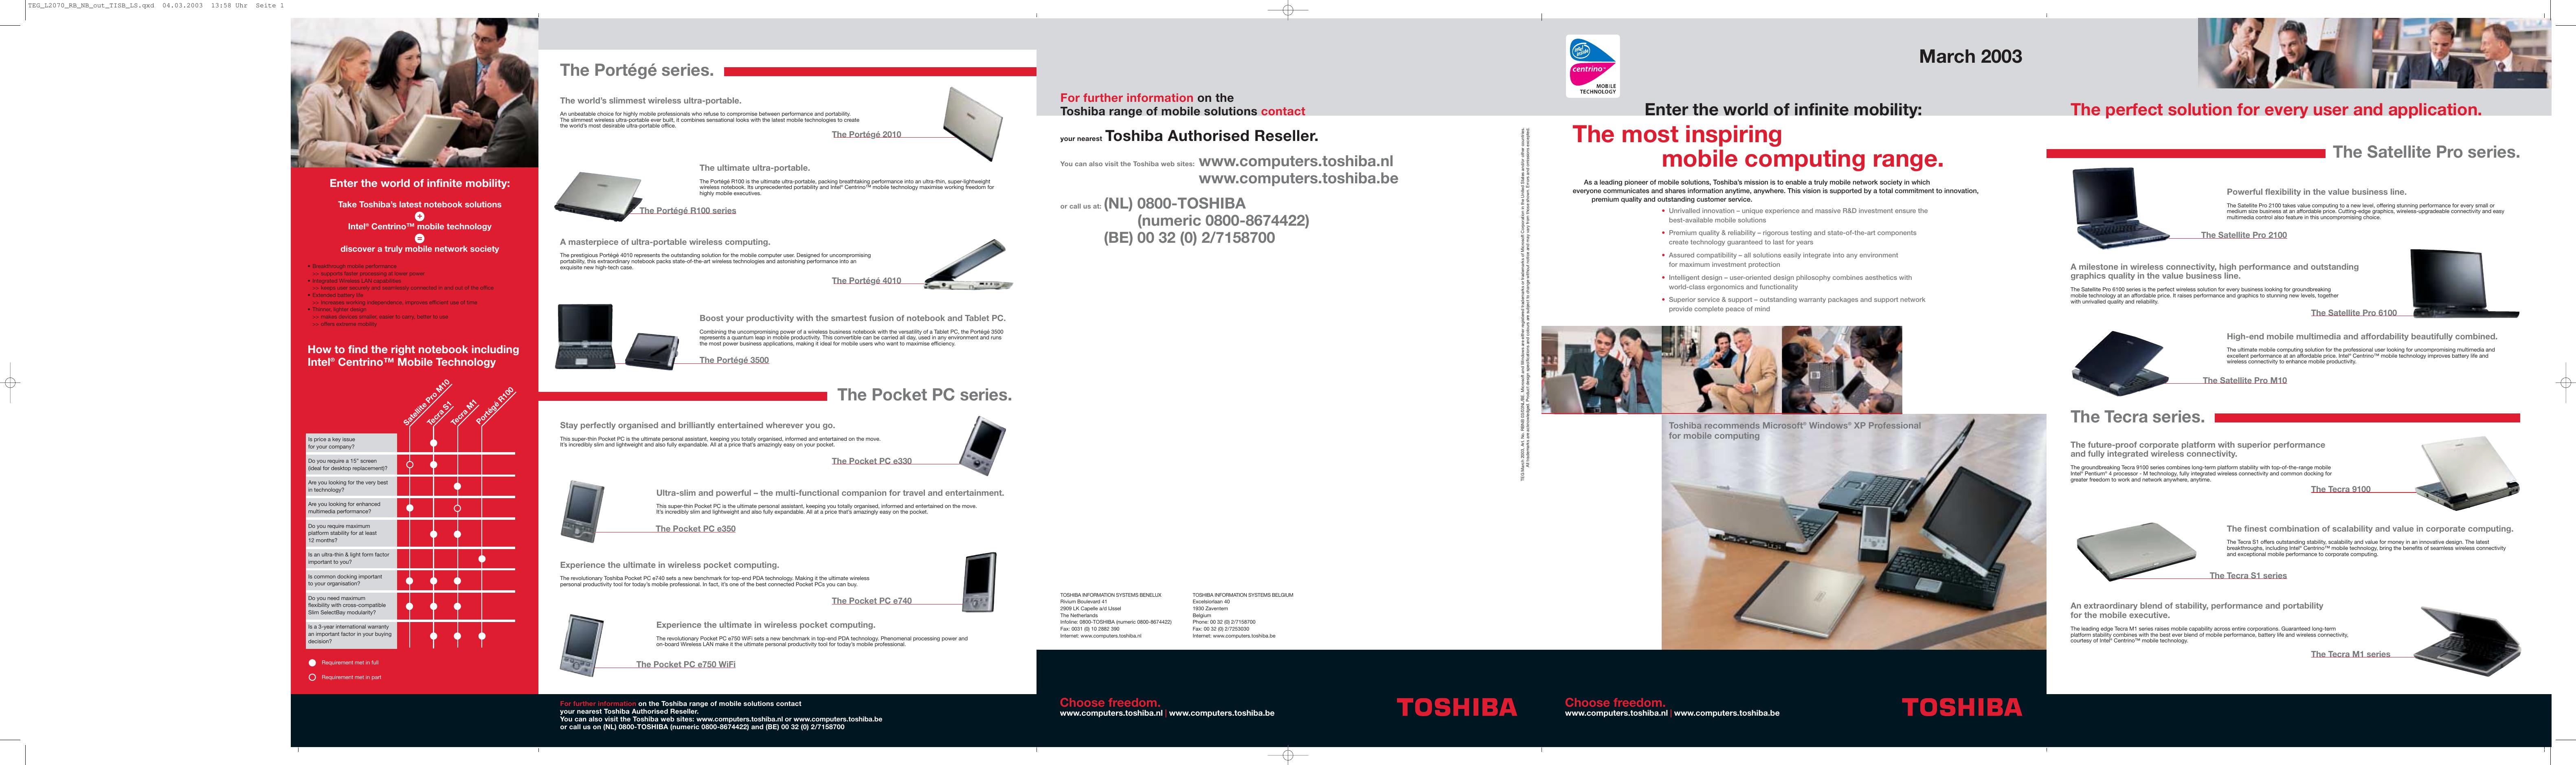 Toshiba Pro 2100 Specifications